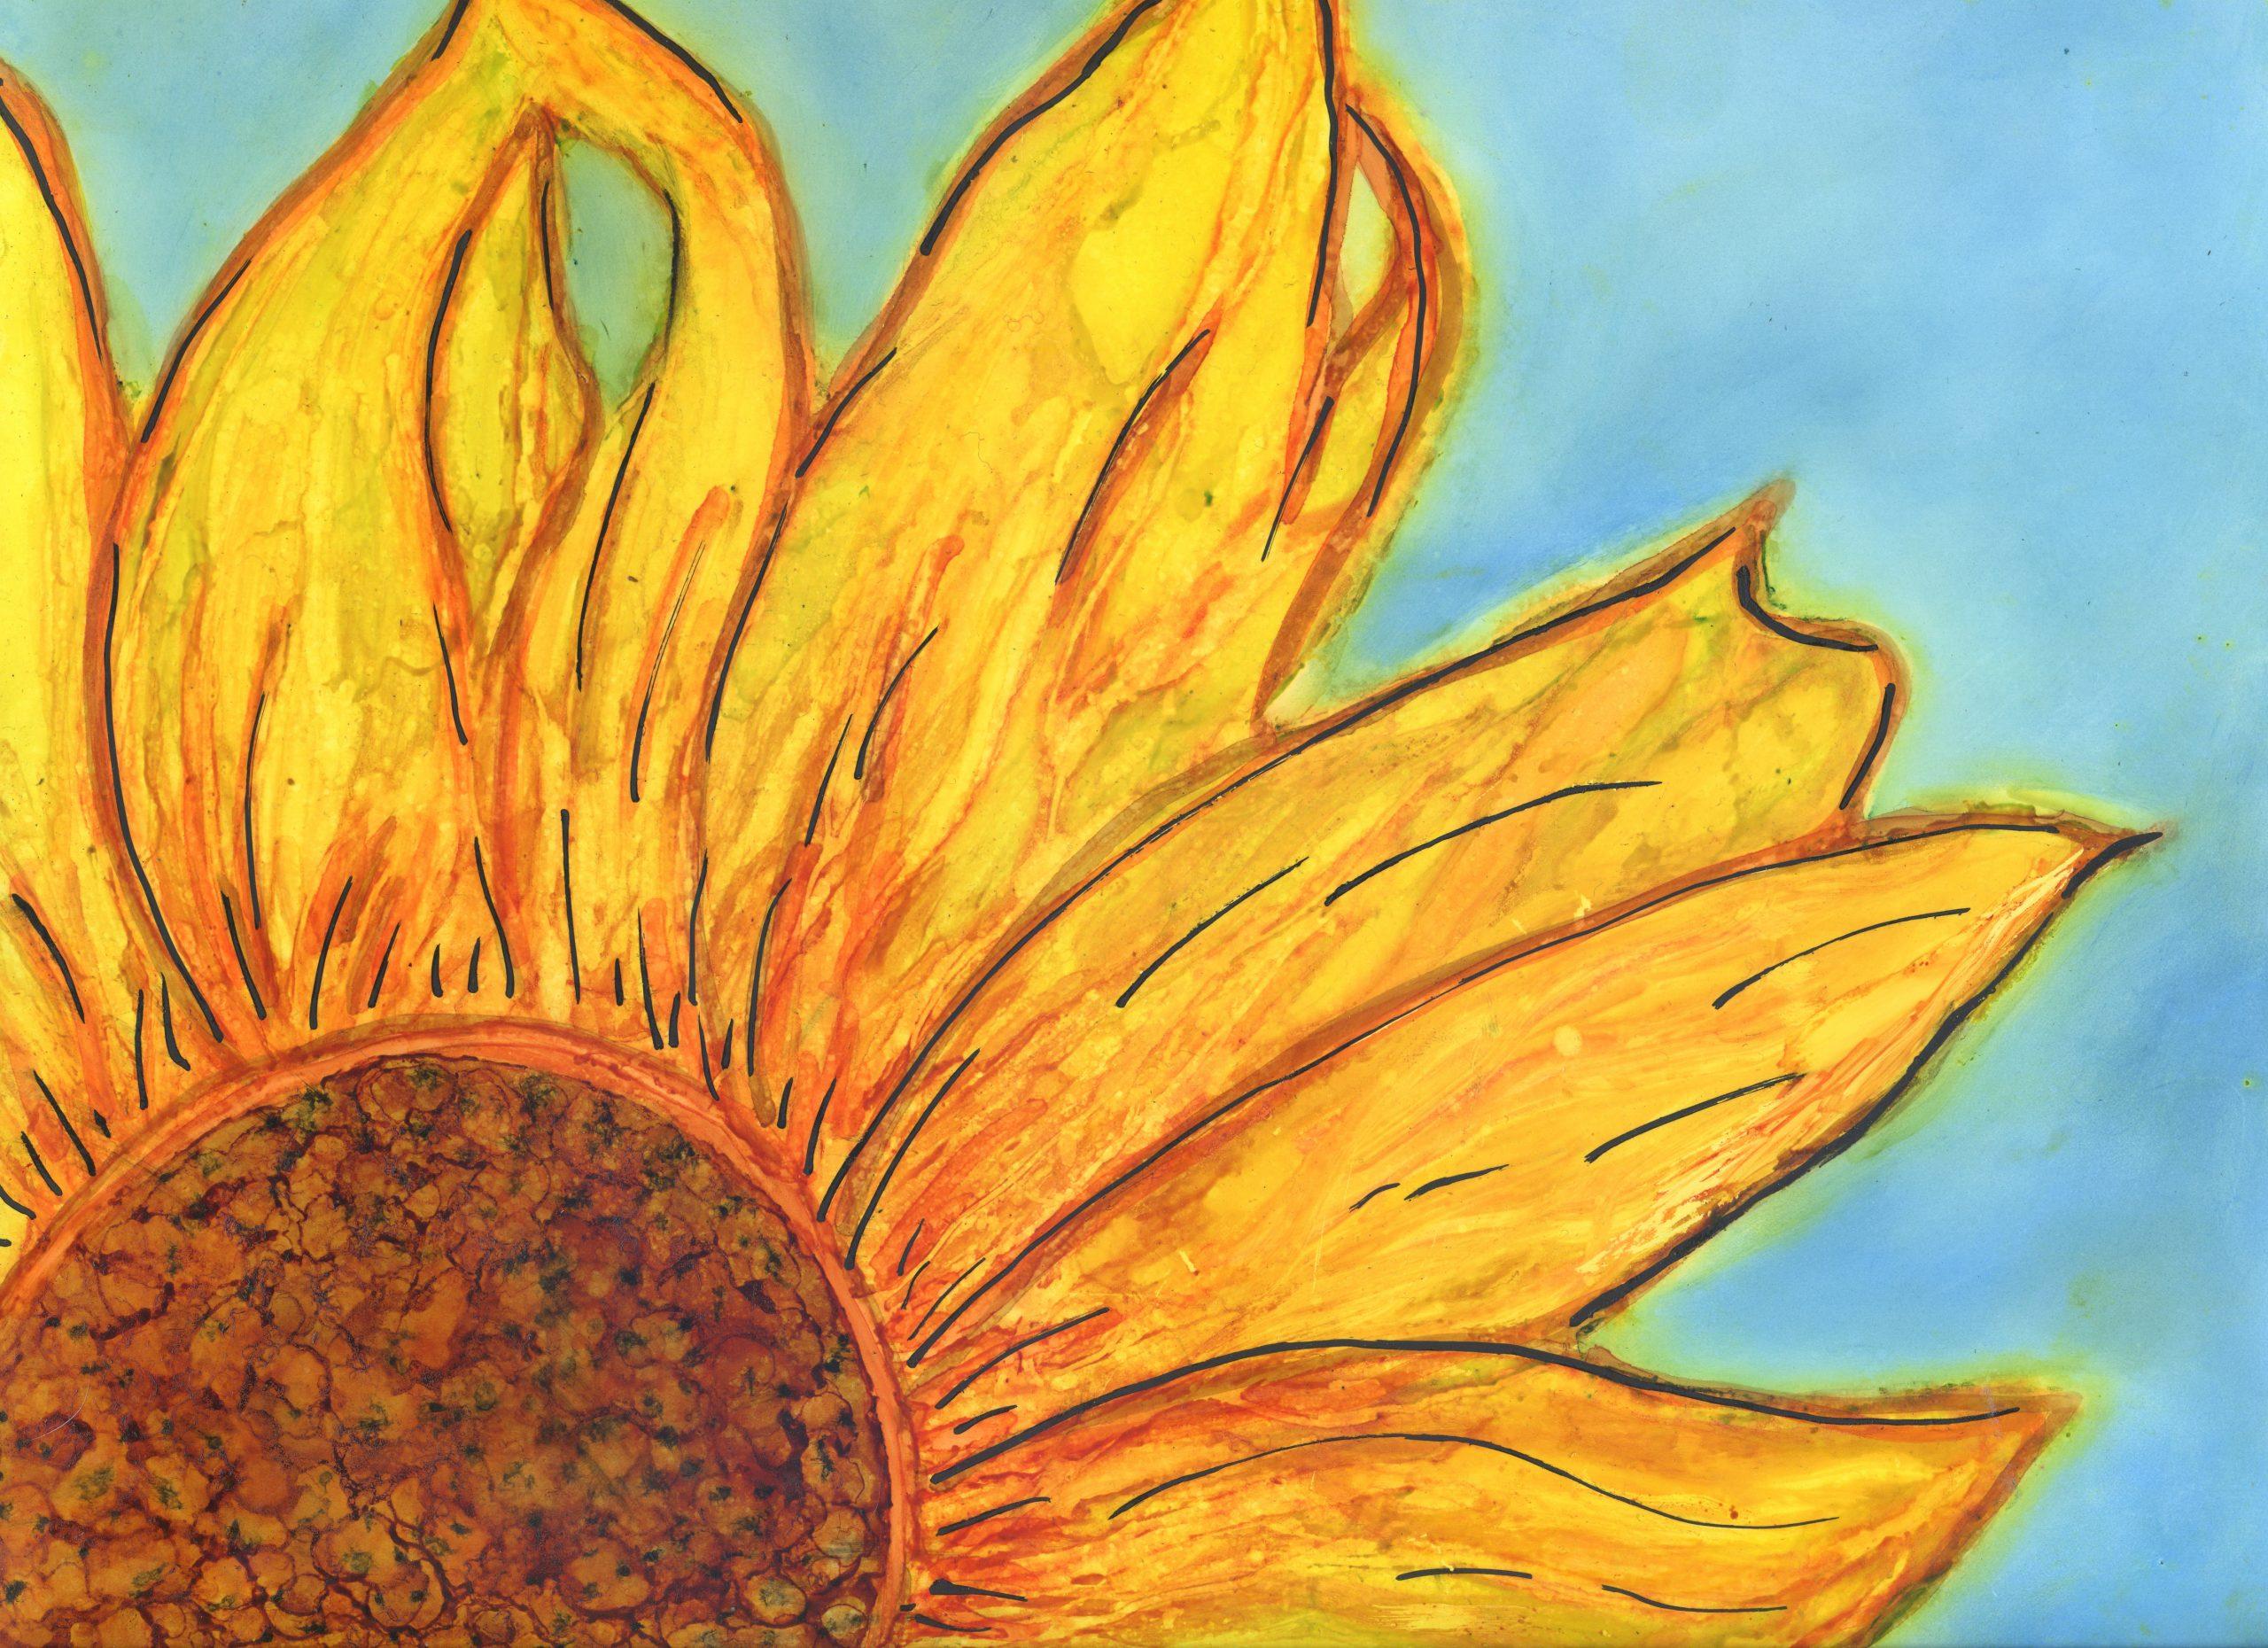 Sunshine Flower - Alcohol Ink - 9 X 12 - $140